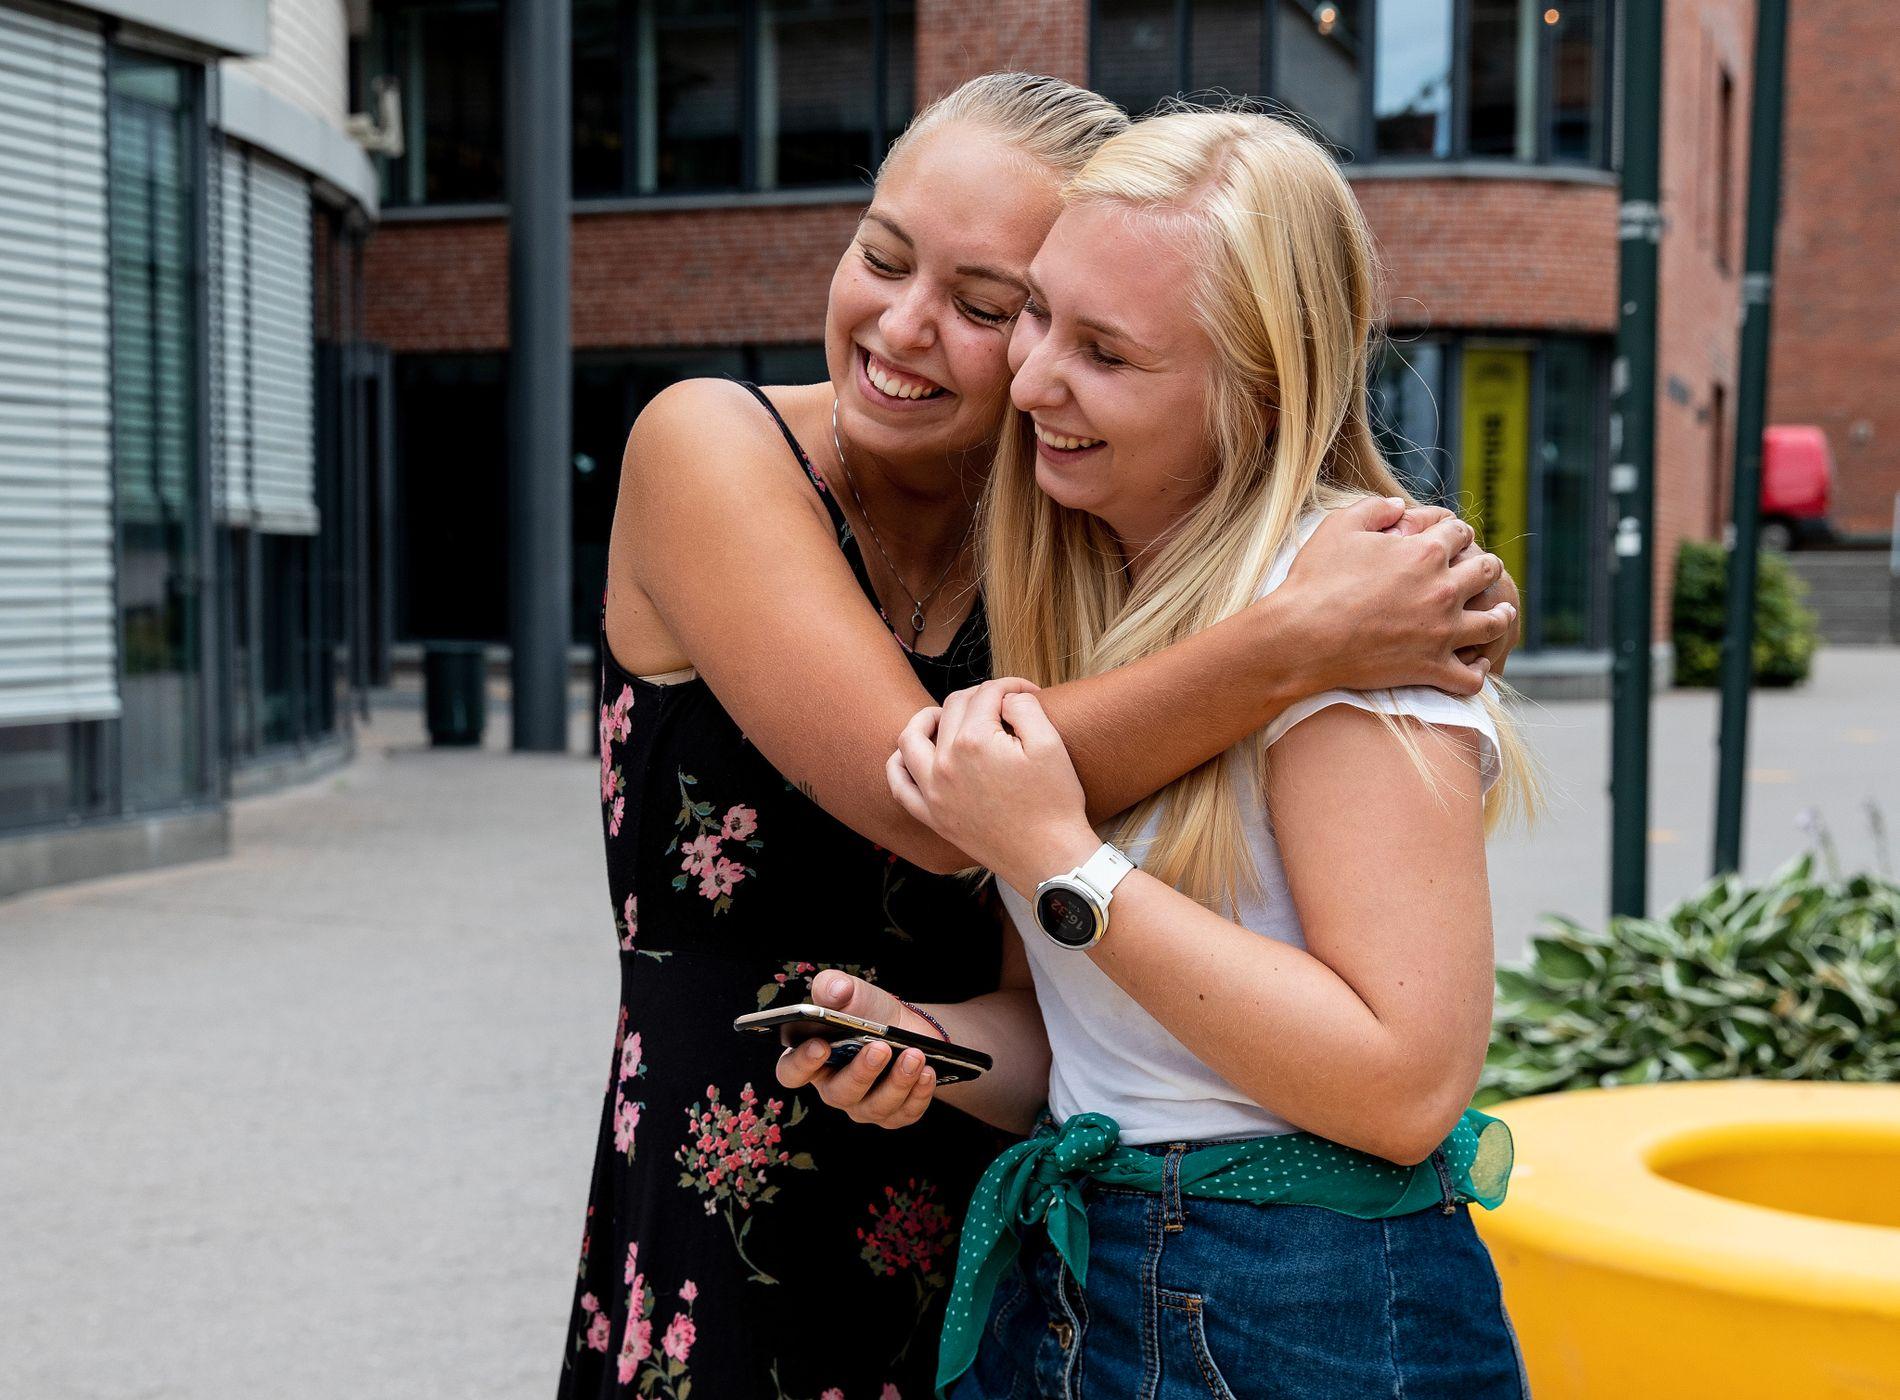 KOM INN: Maya Alice Bratland (19, t.h.) har akkurat fått vite at hun kom inn på lærerstudiet, 5.-10.trinn. Venninnen Stine Skulbru Henriksen (20) har allerede gått på studiet i ett år.